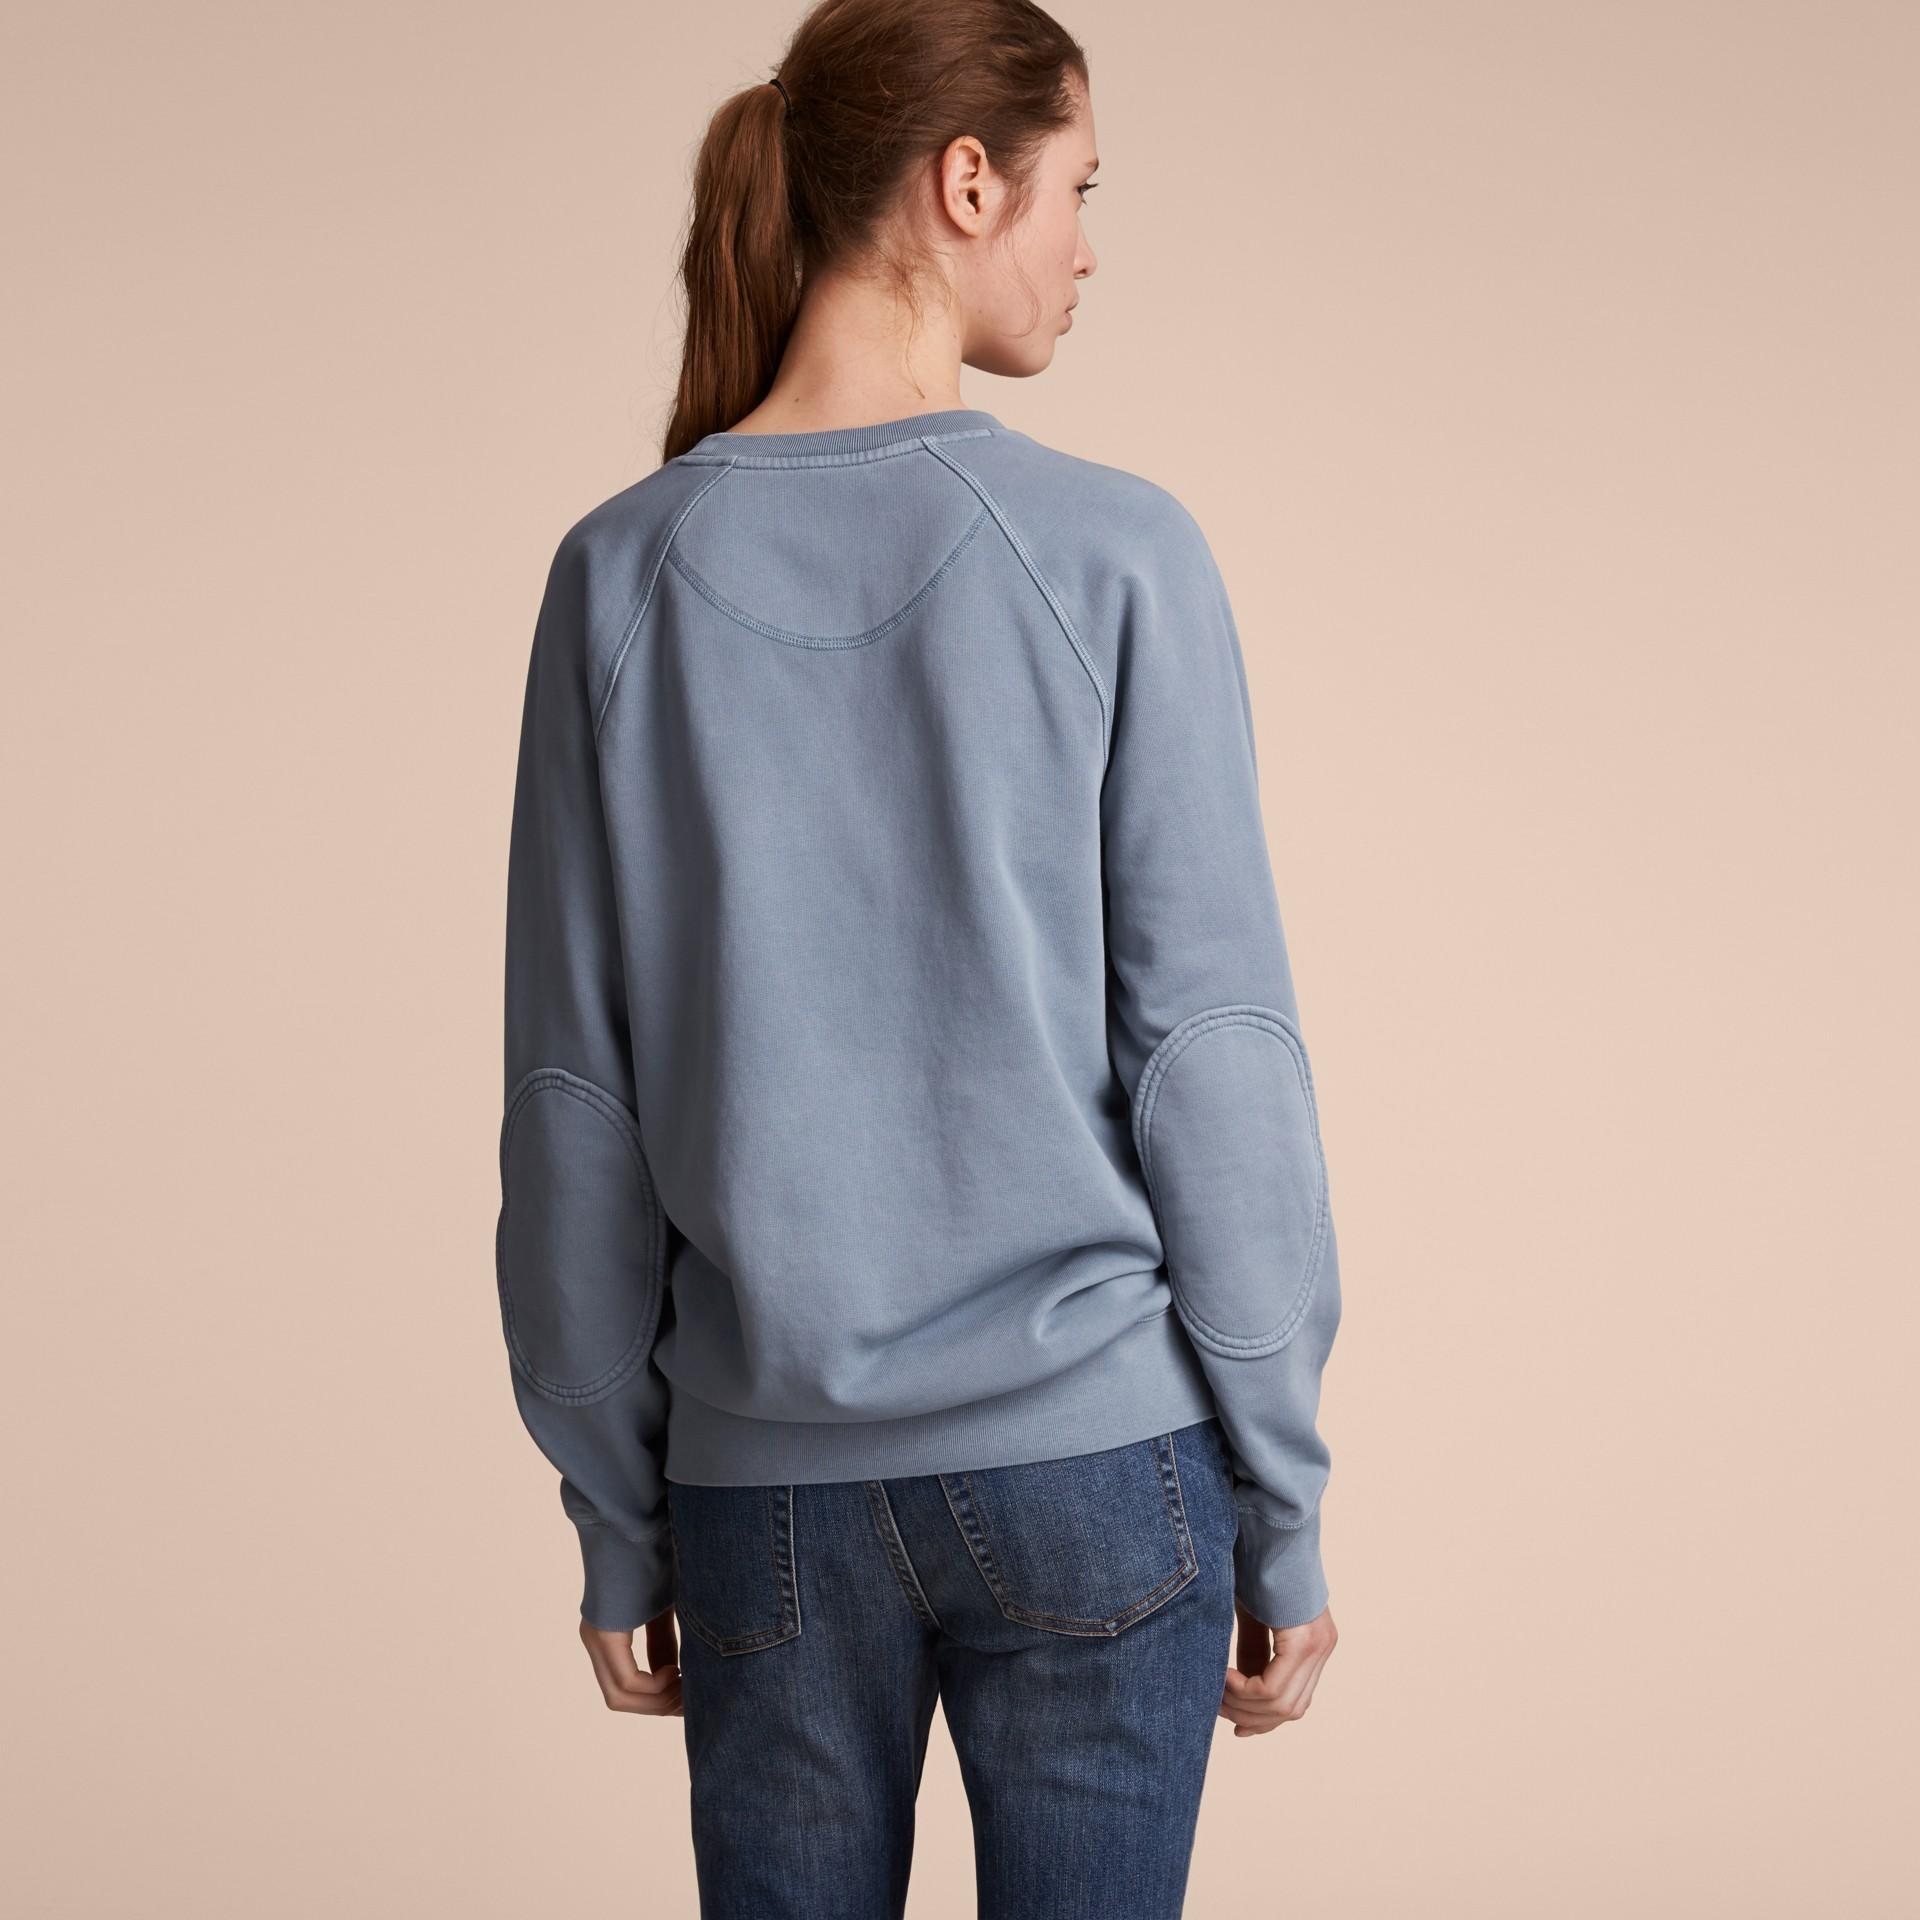 Unisex Pigment-dyed Cotton Oversize Sweatshirt in Dusty Blue - Women | Burberry Australia - gallery image 7